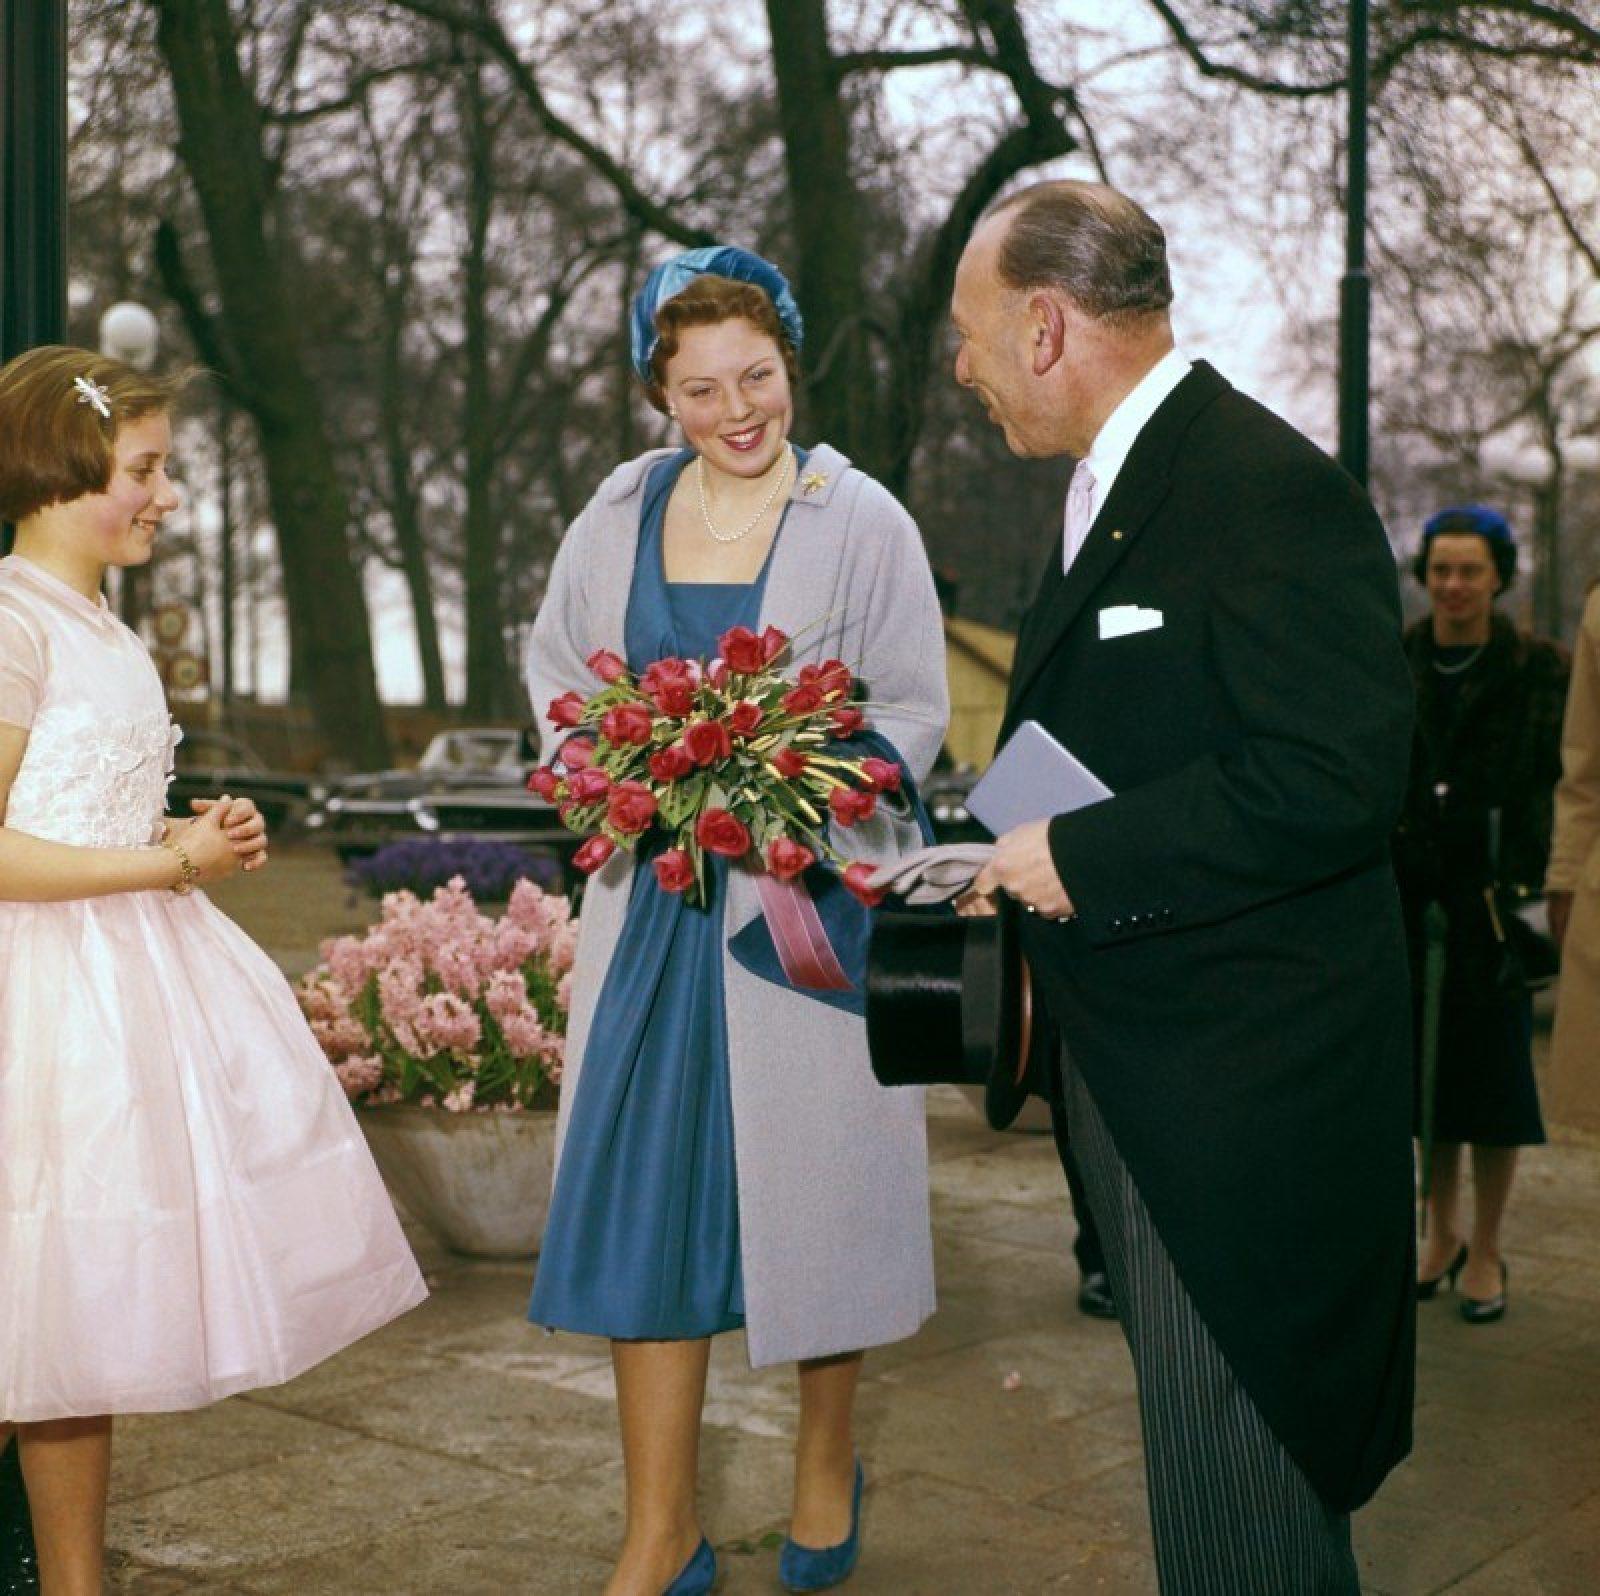 19600325 Beatrix opent Floriade 457074687 ANP